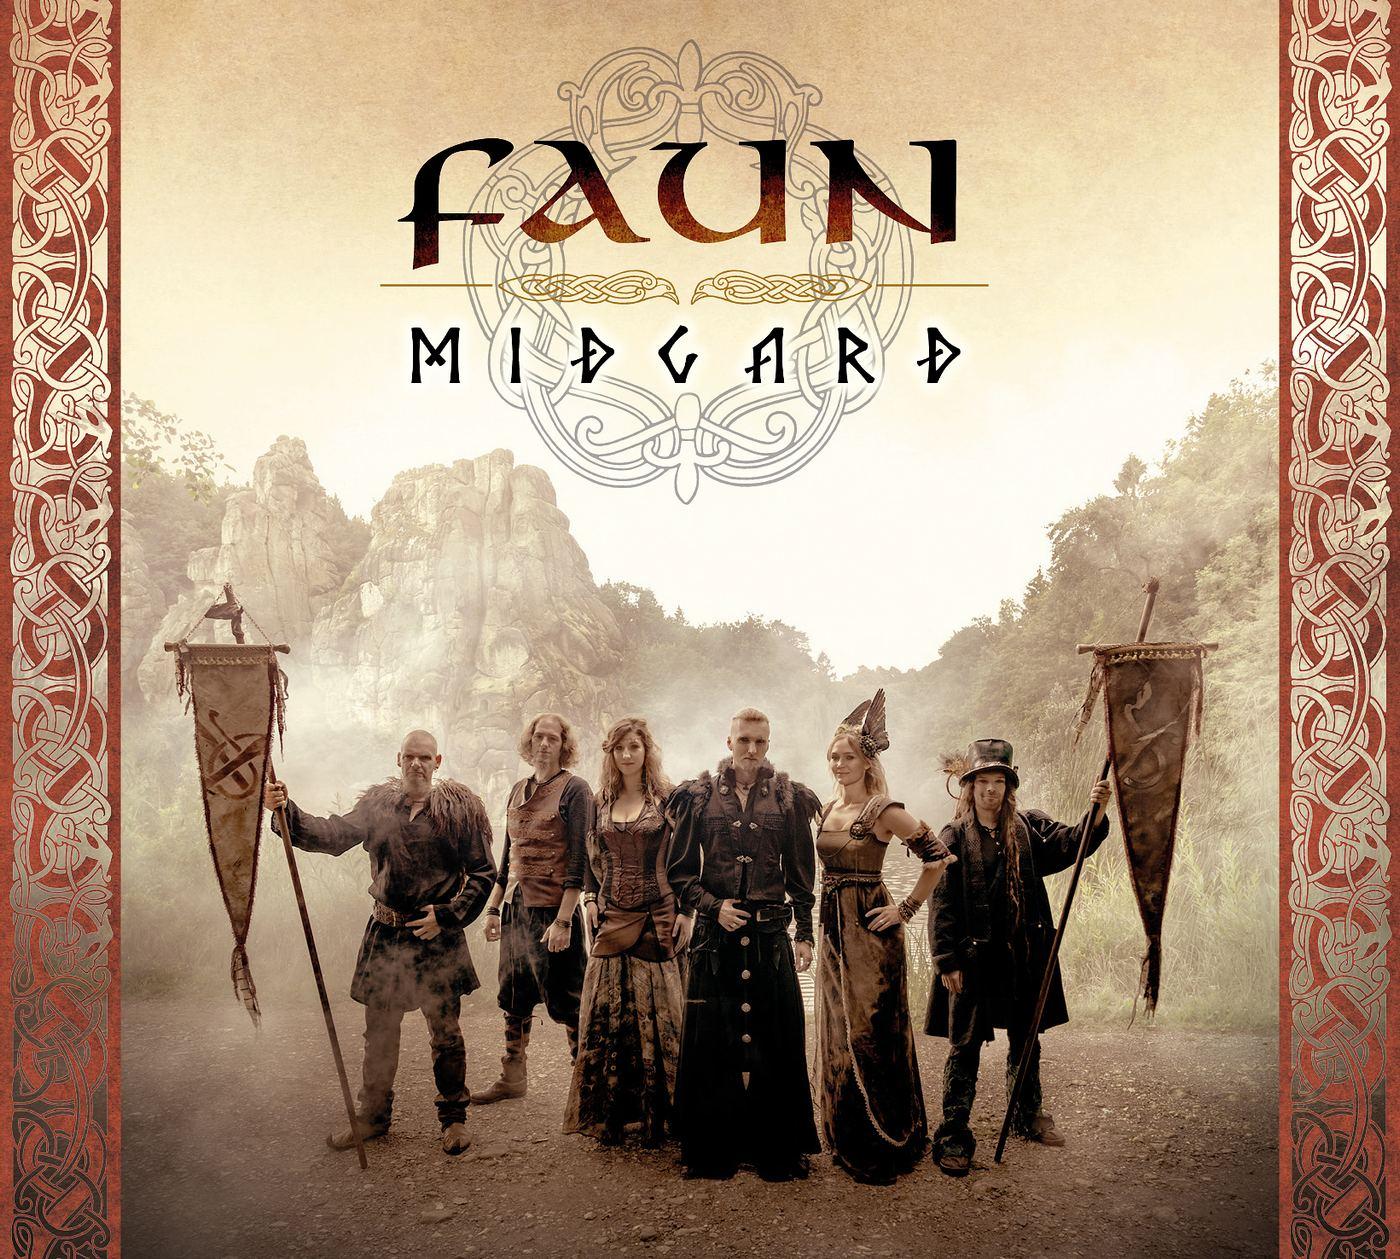 Faun: Midgard (2016) Book Cover